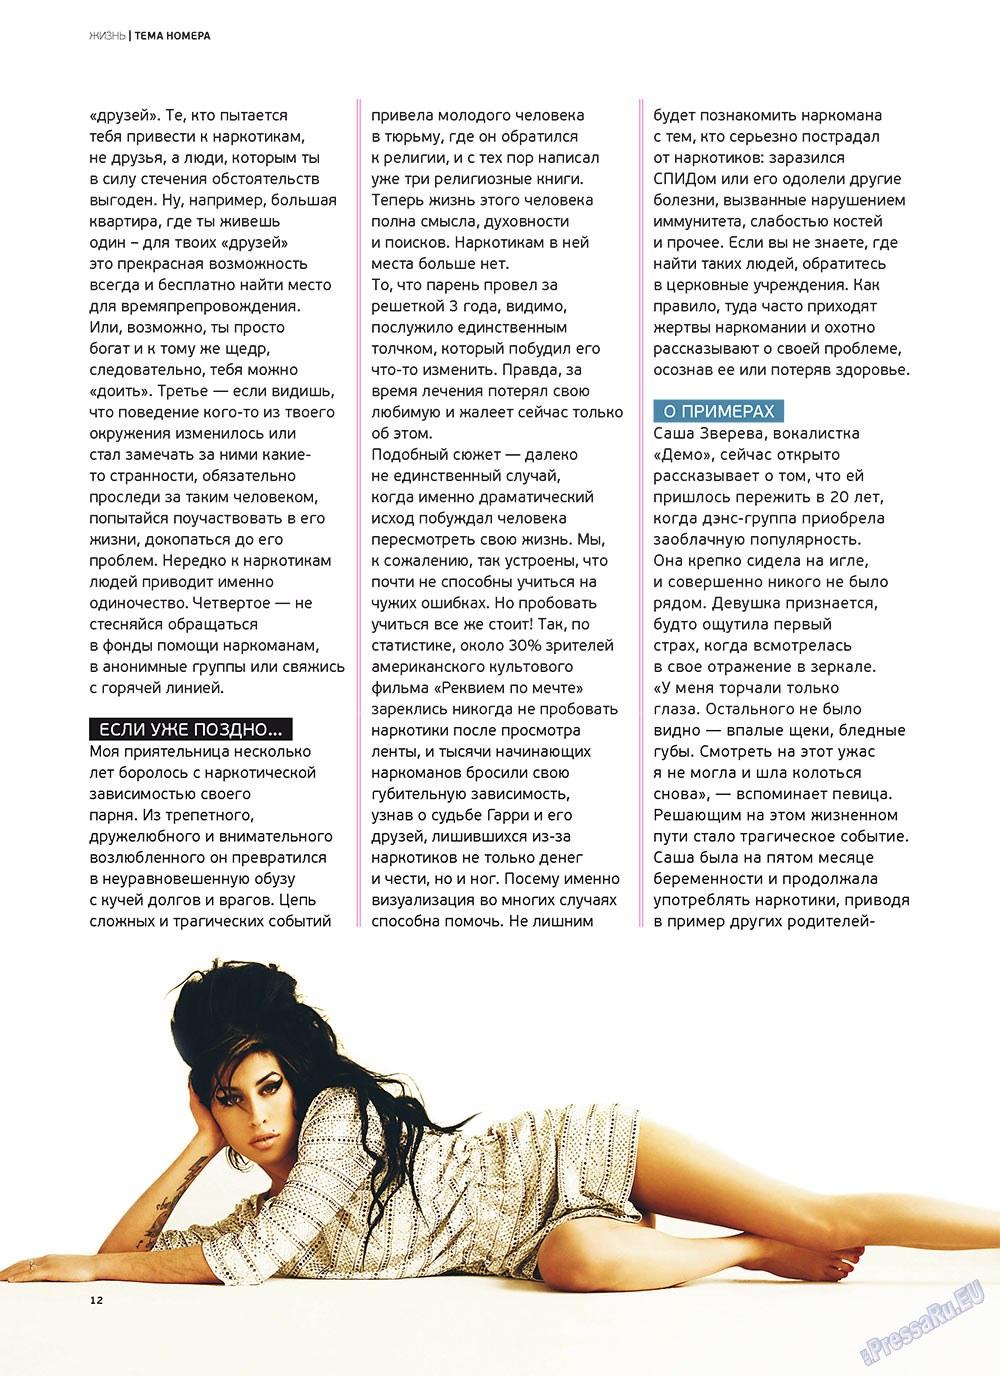 Артек (журнал). 2011 год, номер 4, стр. 14